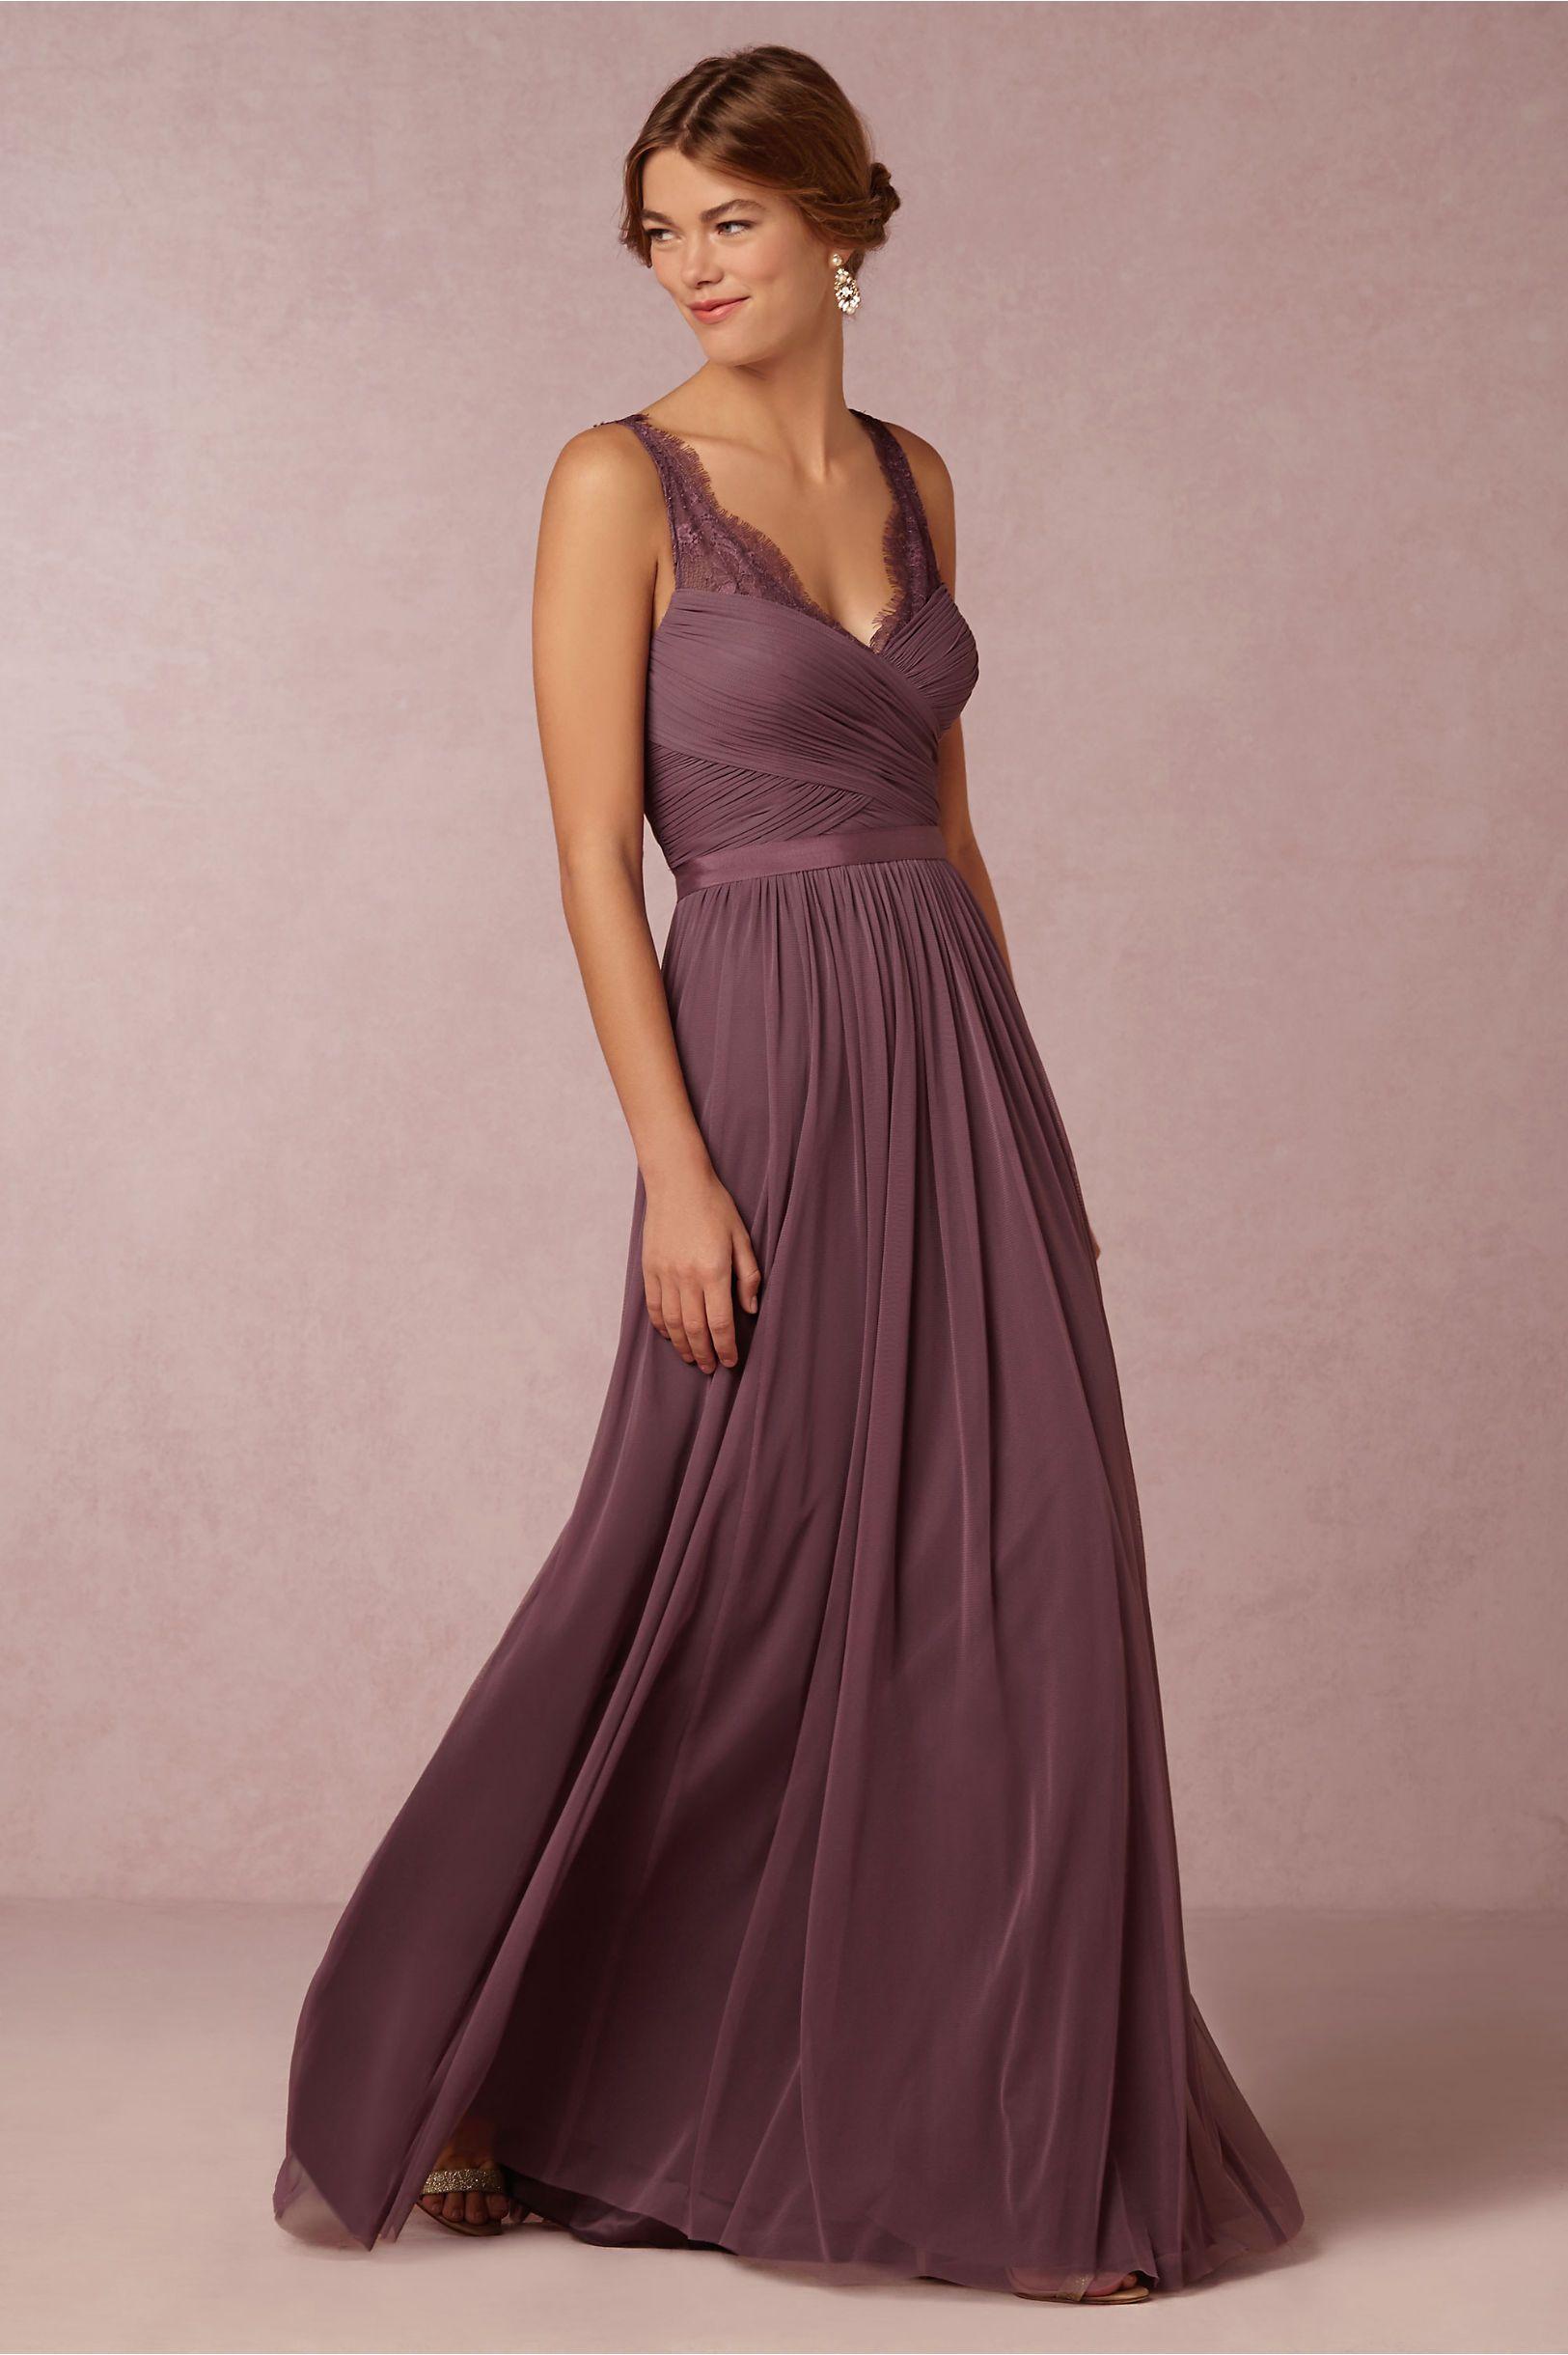 Fleur dress in bridesmaids bridesmaid dresses long at bhldn